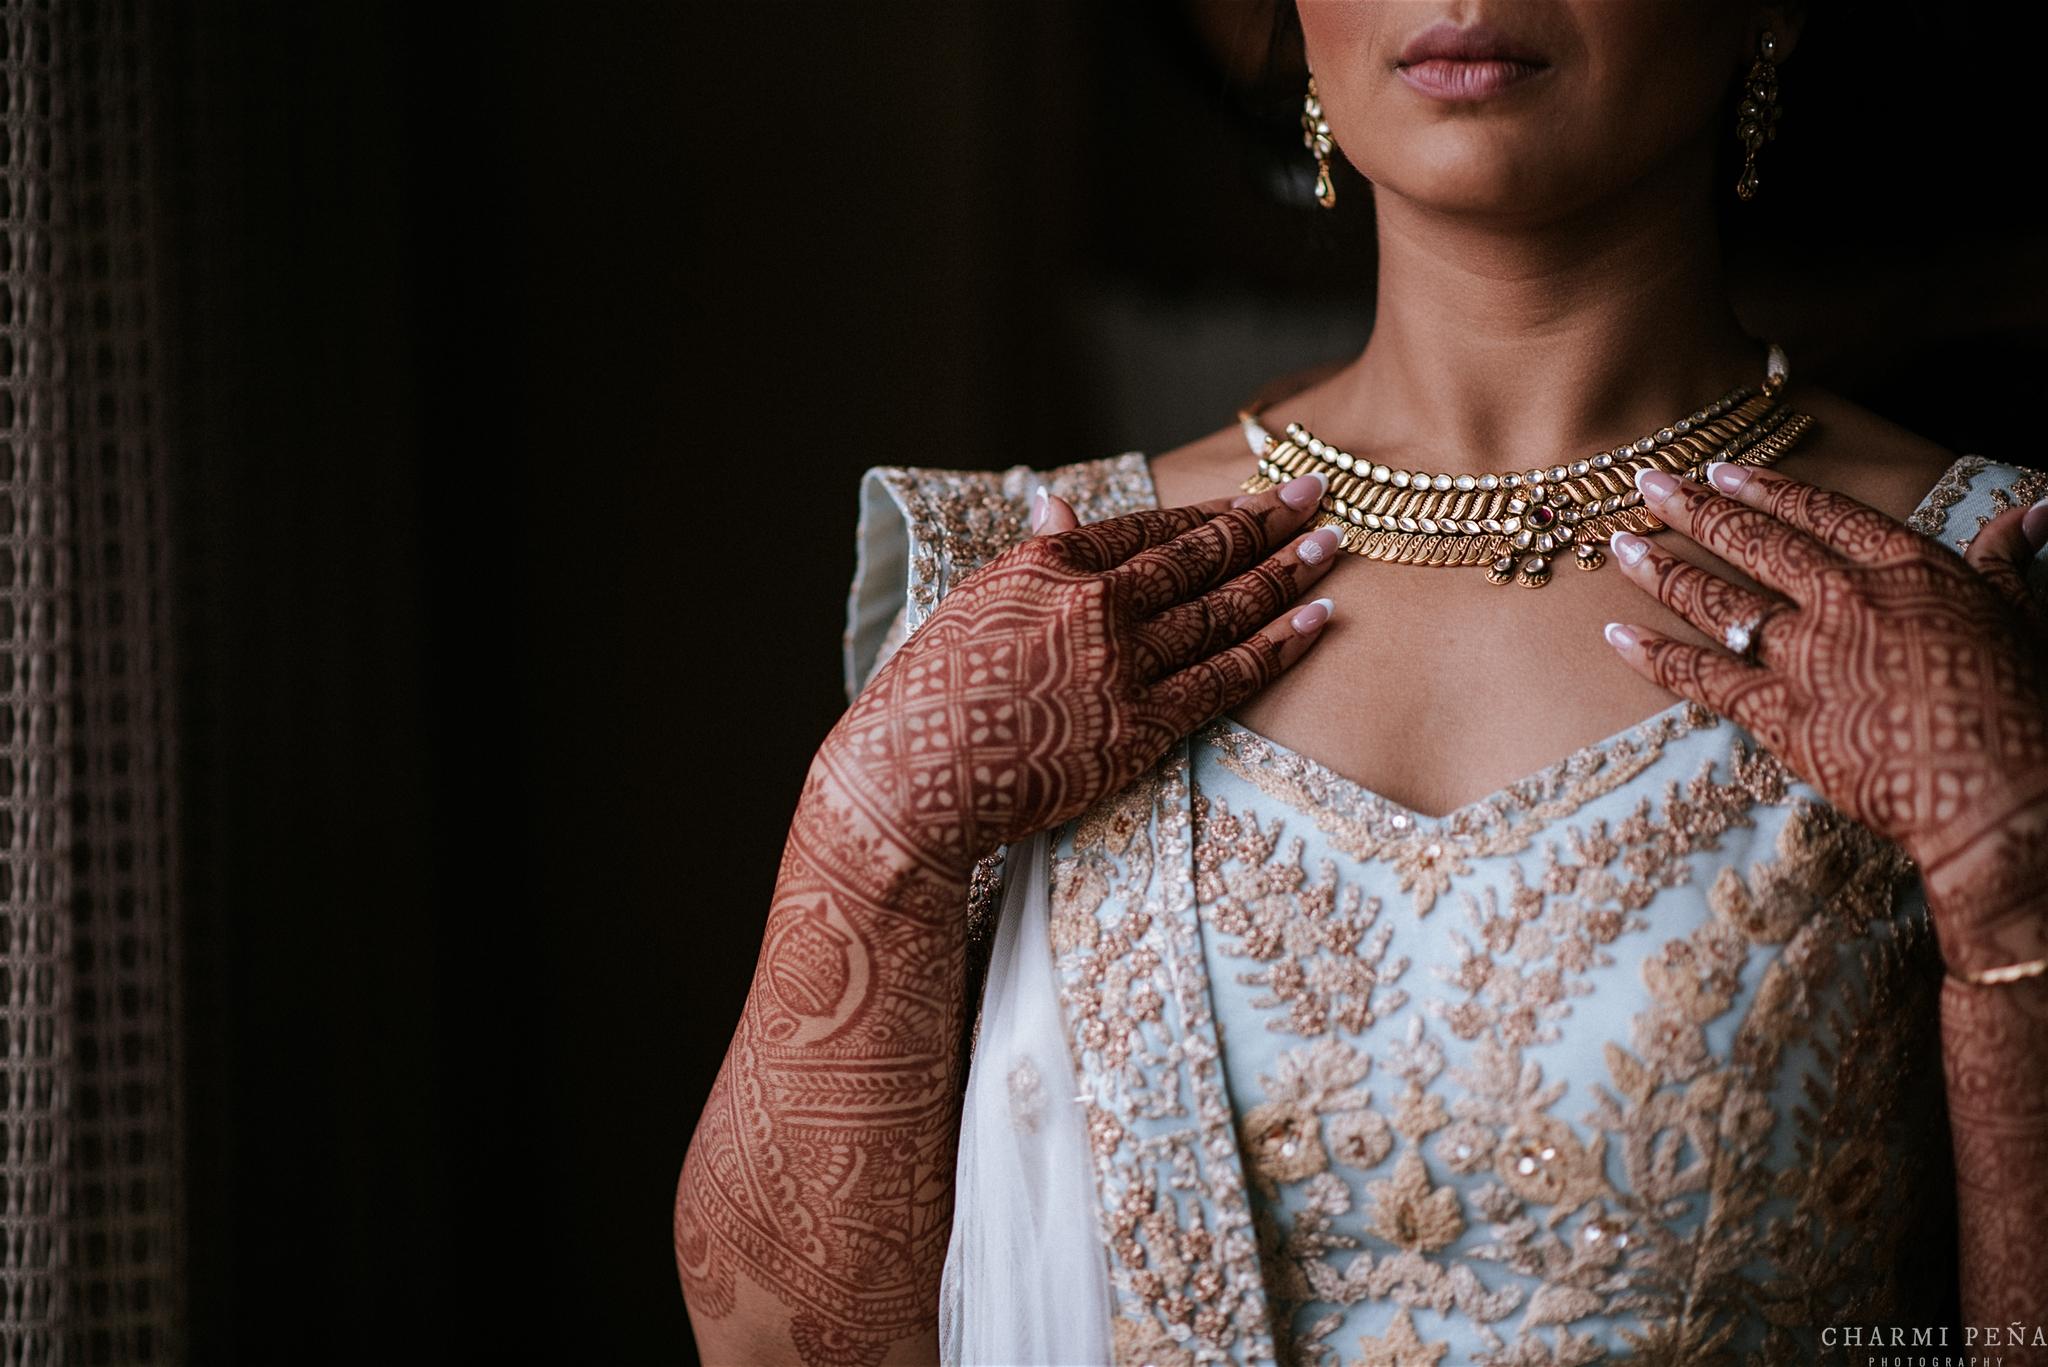 INDIAN WEDDING BRIDE CLOSUP.jpg